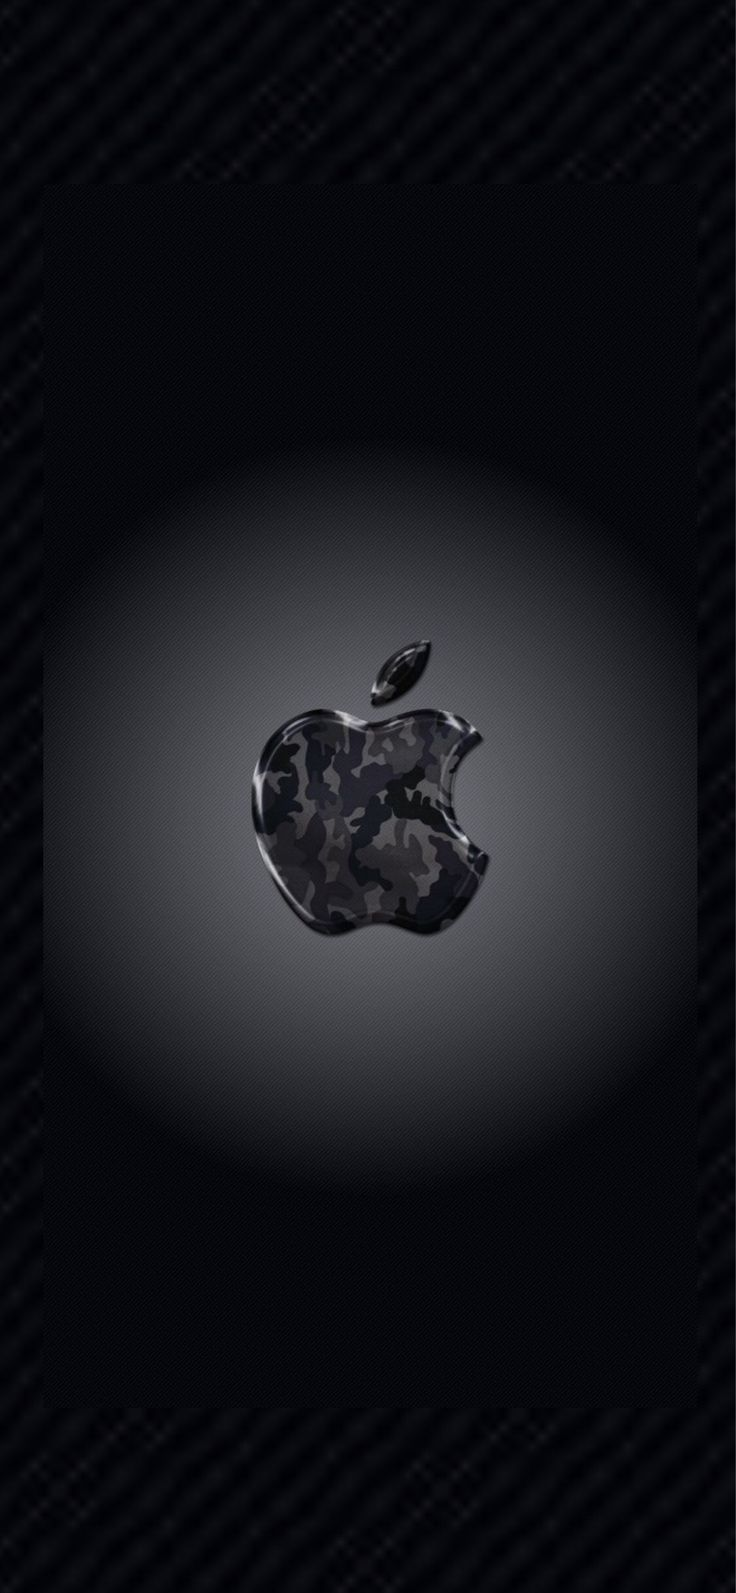 Ios11 Ios12 Lockscreen Homescreen Backgrounds Ap Apple Desktop Ideas Of Apple Desktop App Apple Wallpaper Apple Wallpaper Iphone Iphone 6s Wallpaper